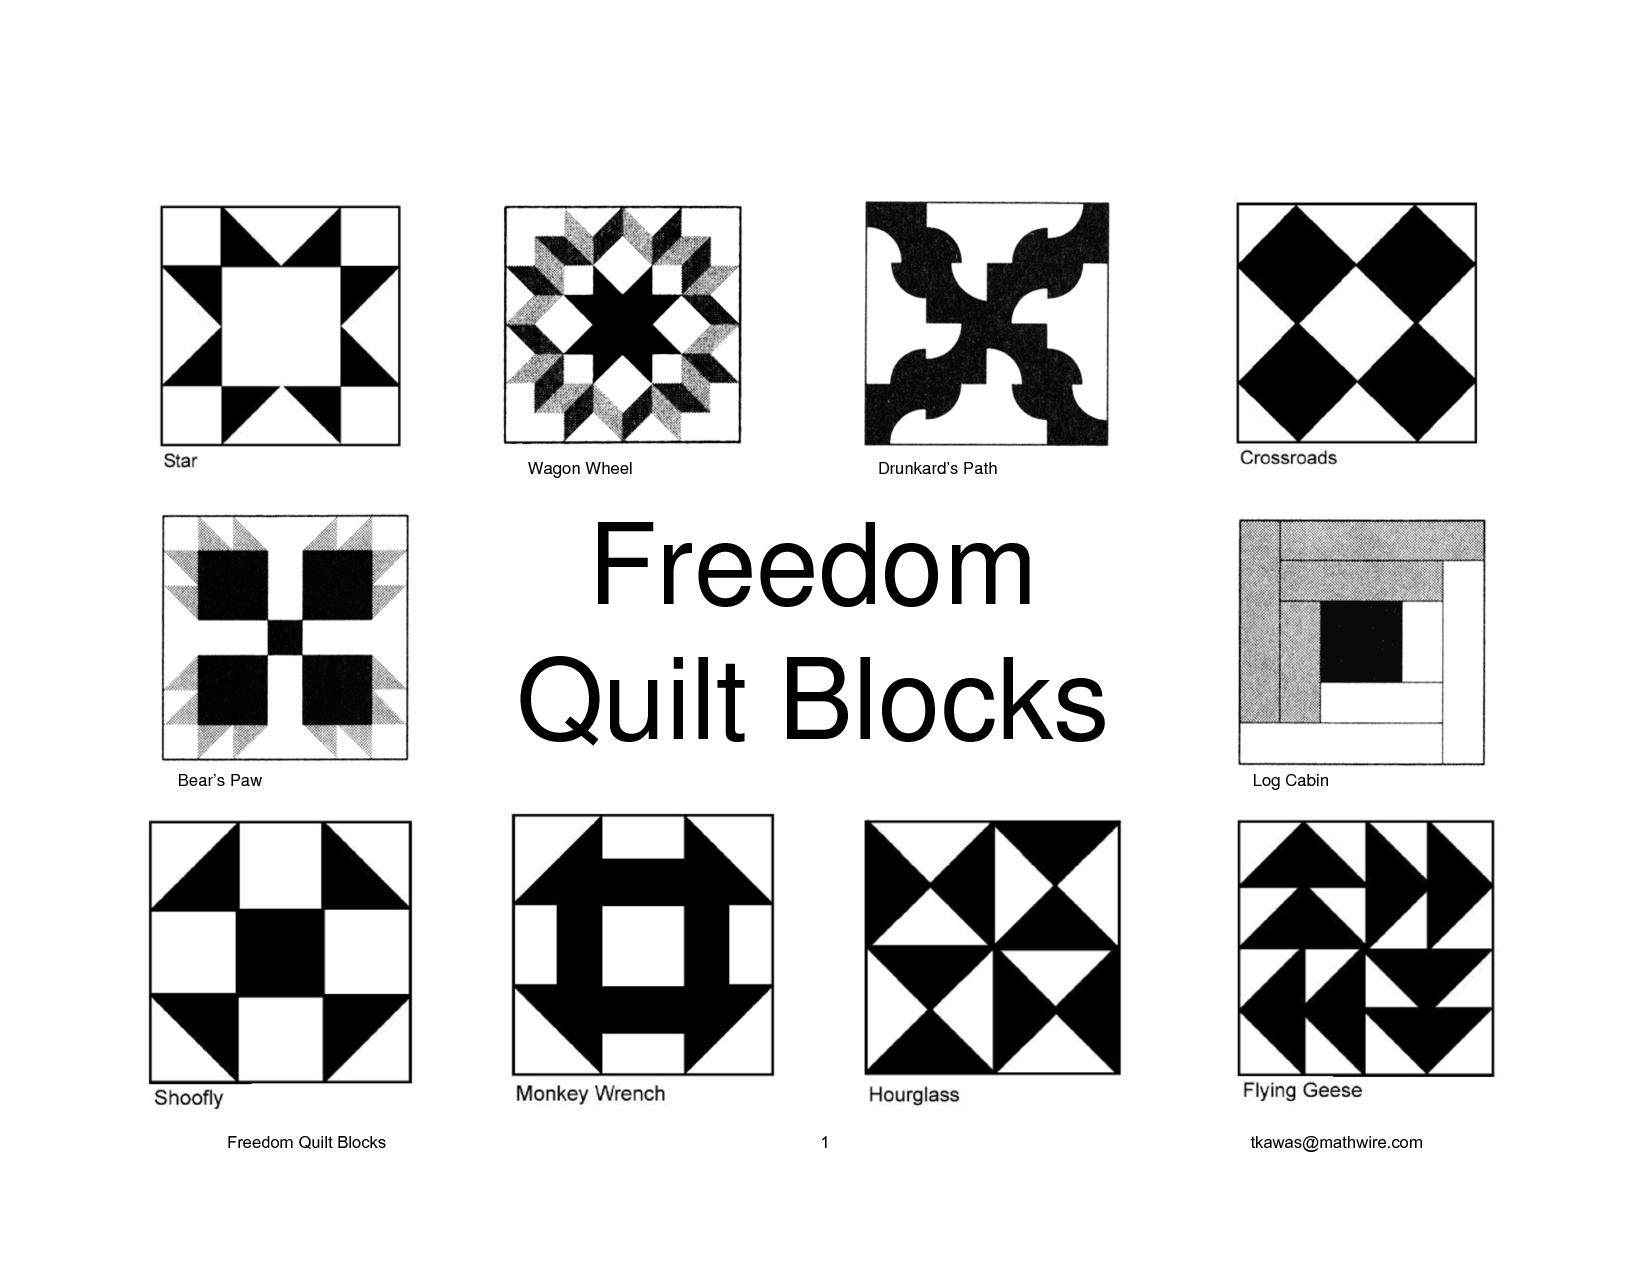 Freedom Quilt Blocks Imgcstoccdn Thumb Orig